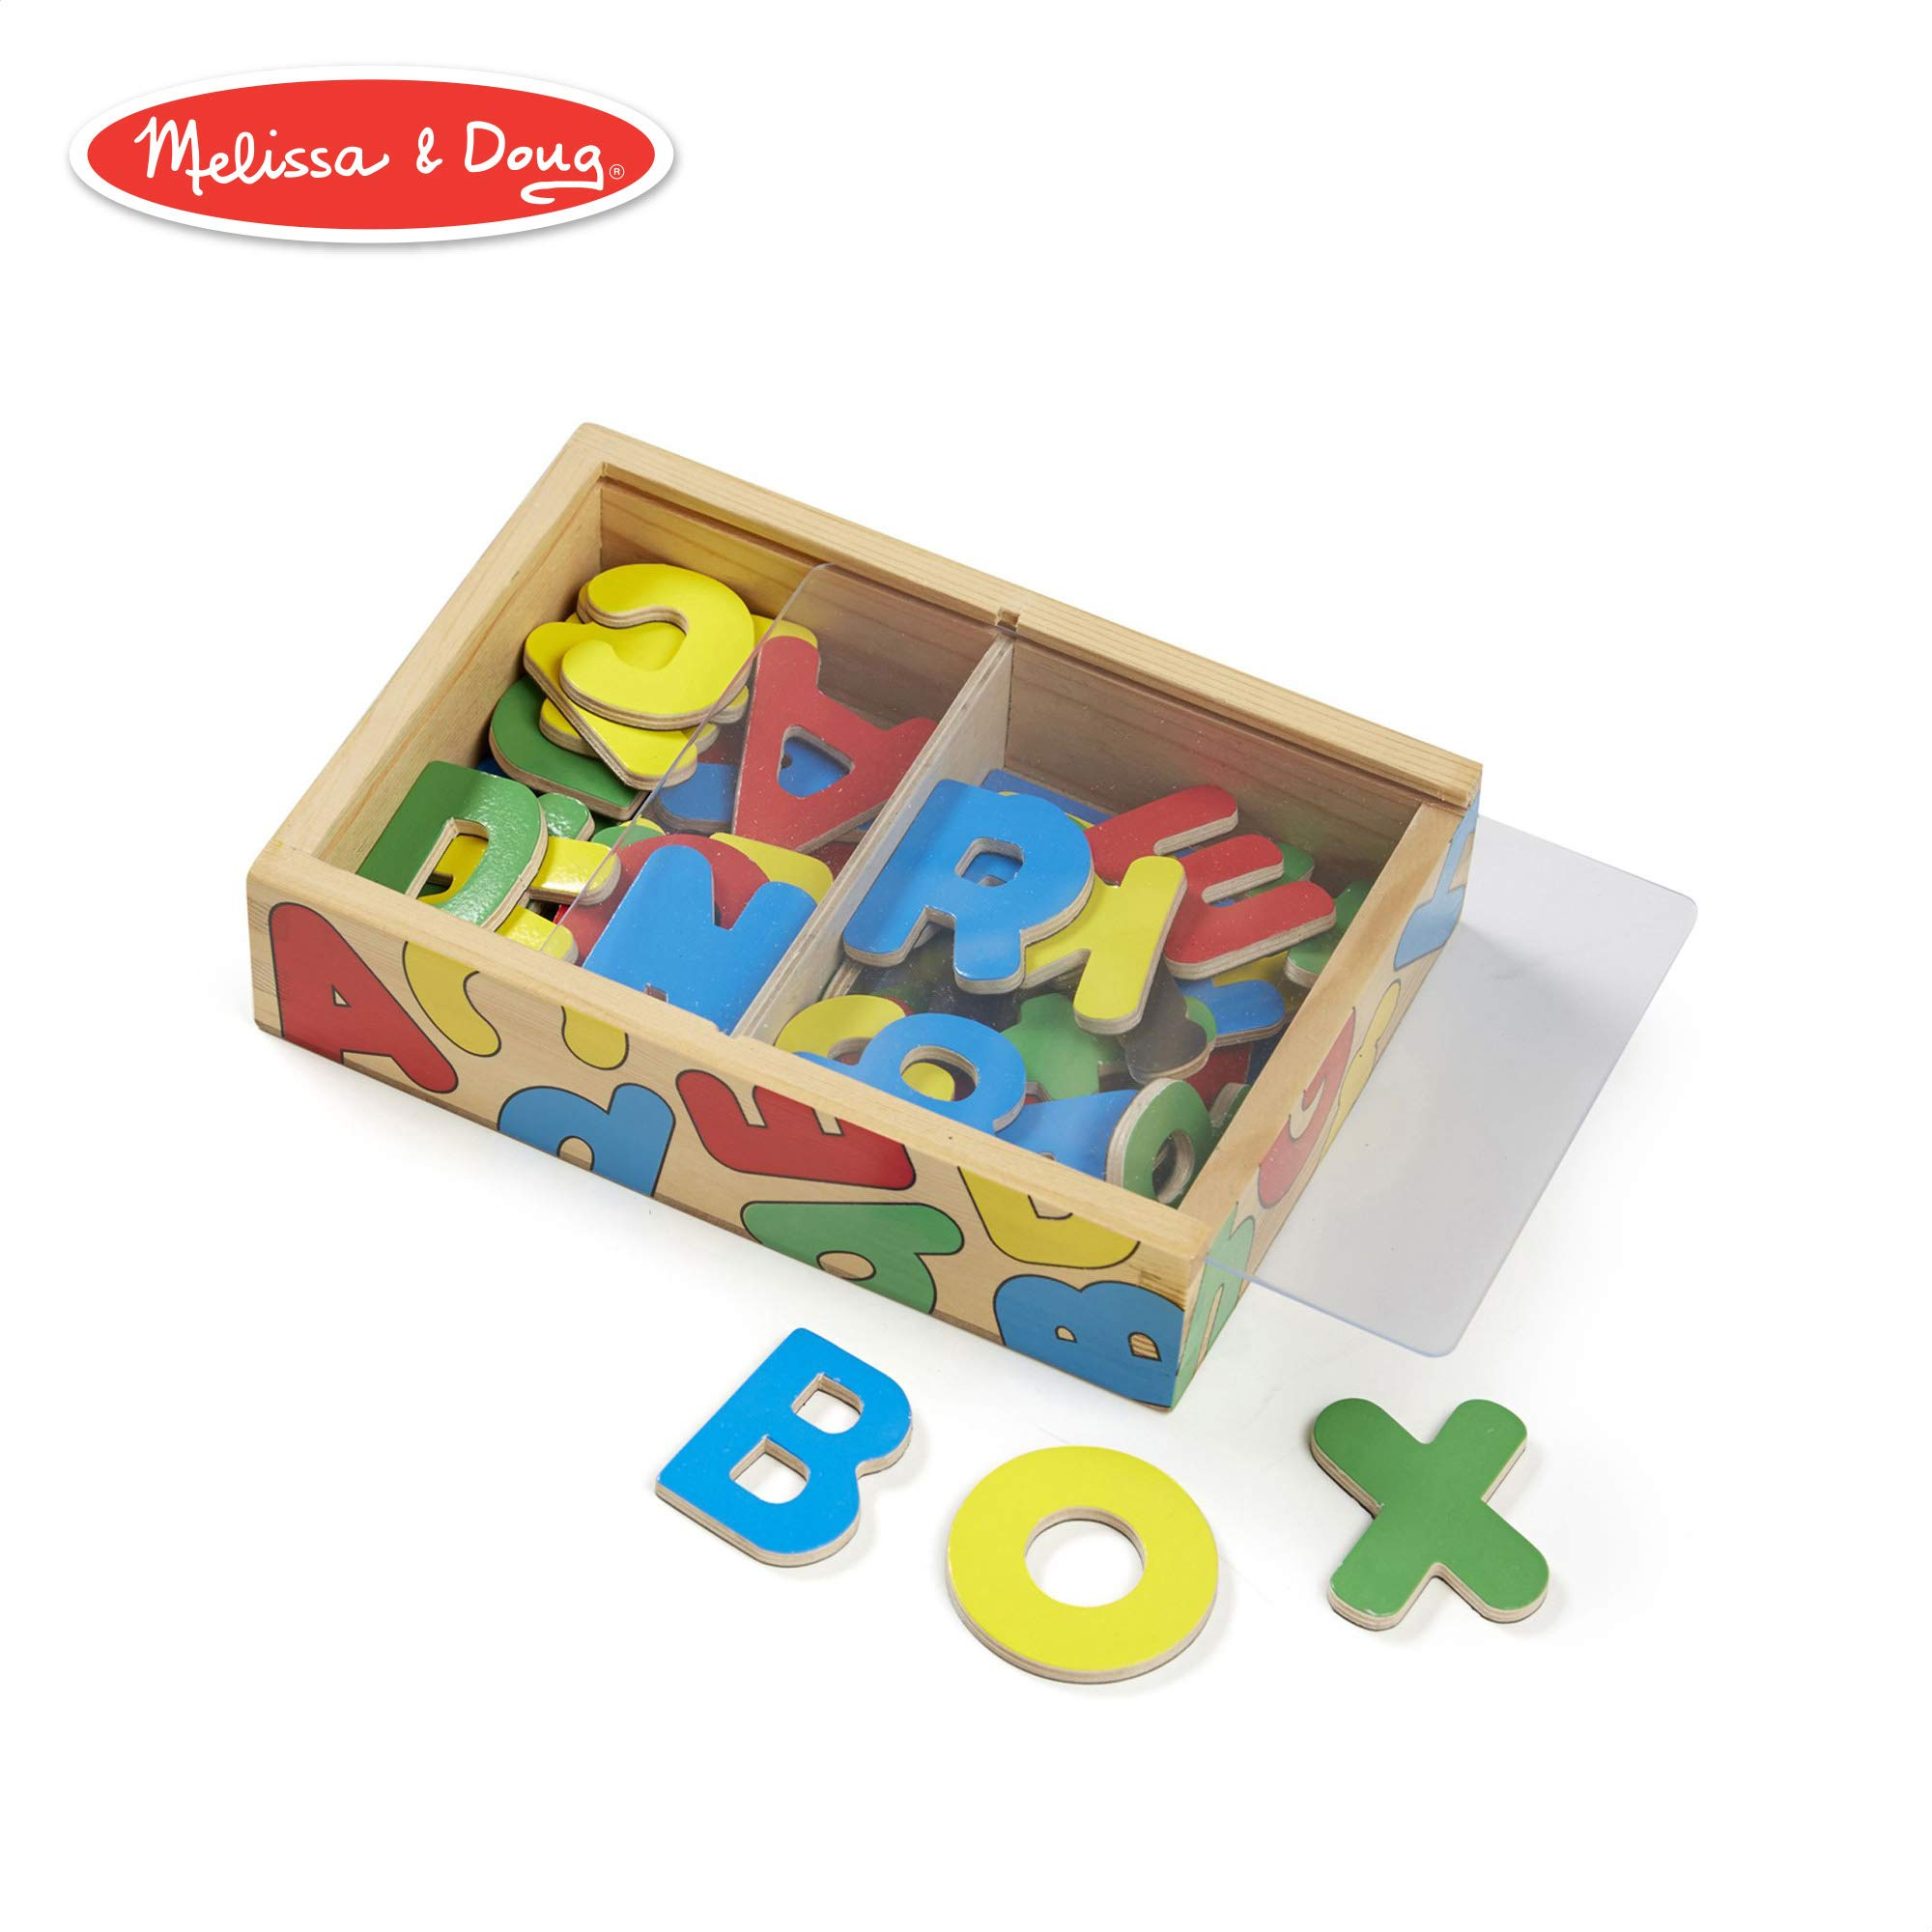 Melissa & Doug 52 Wooden Alphabet Magnets in a Box (Developmental Toys, Sturdy Wooden Construction, 52 Pieces) by Melissa & Doug